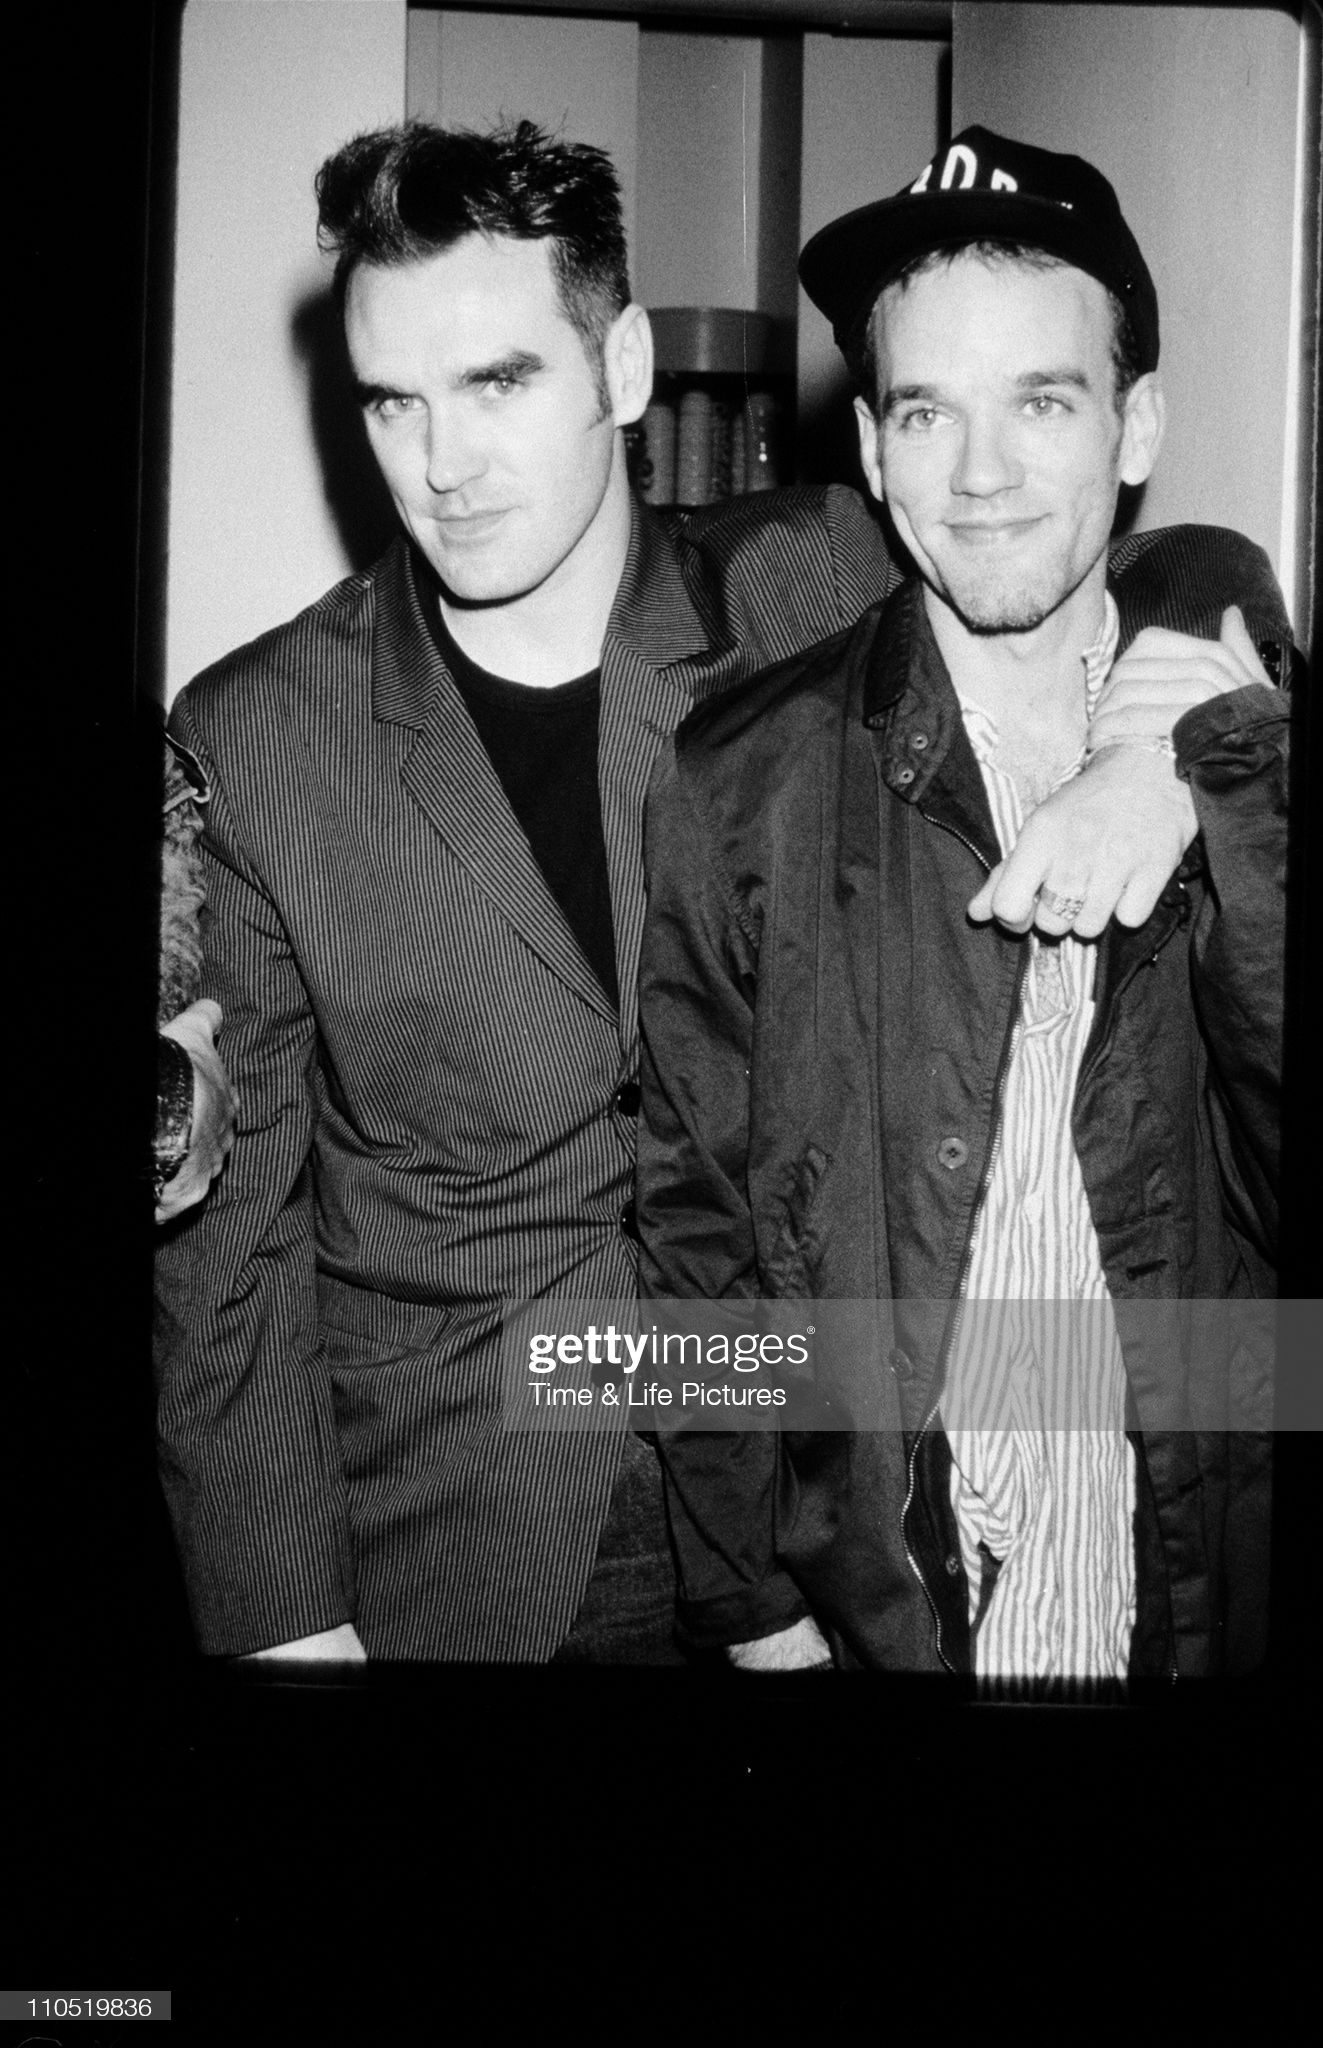 Moz&Michael.jpg